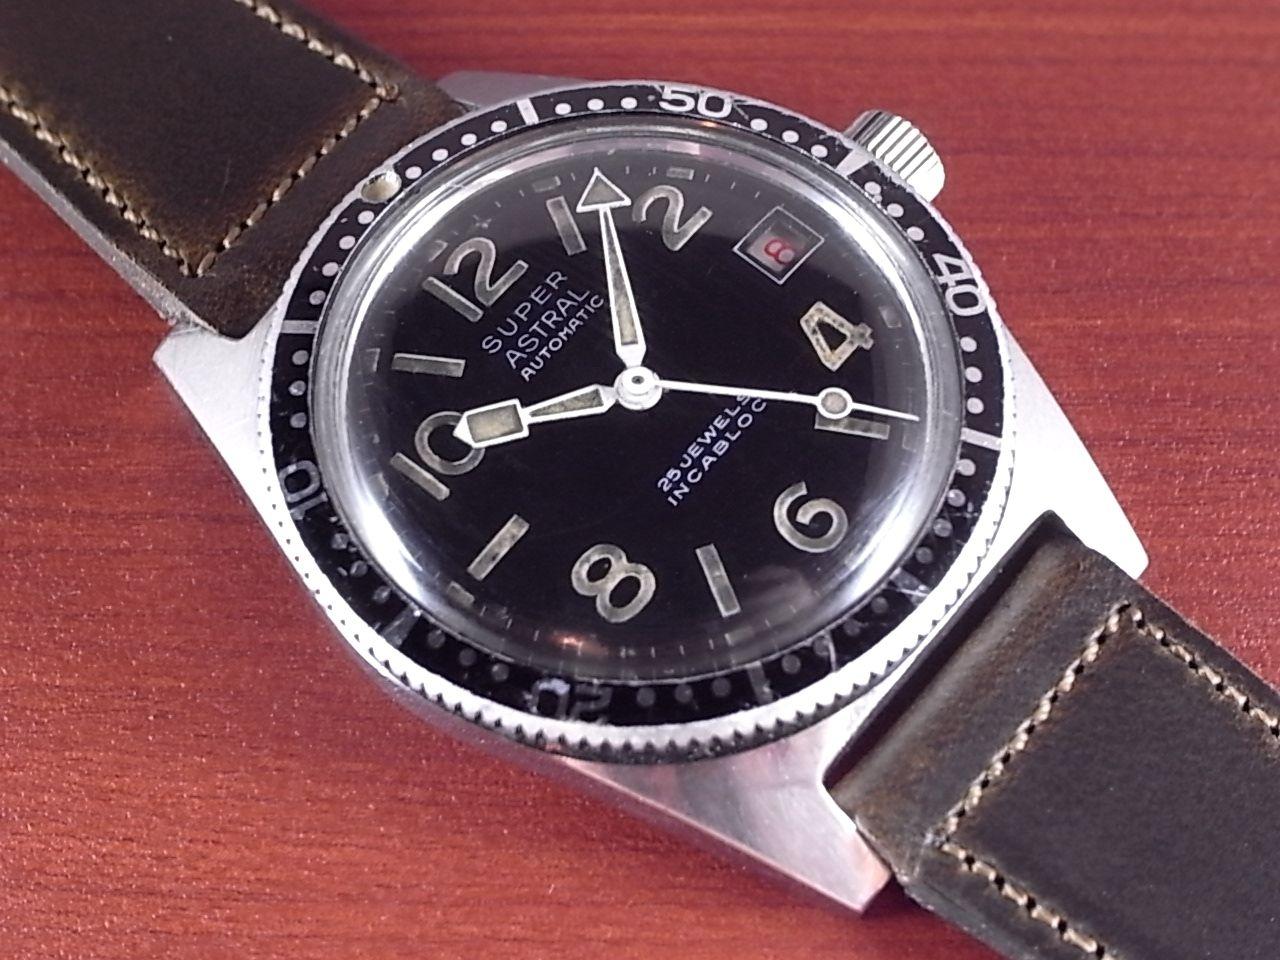 b84b0316df スーパーアストラル ダイバーズウォッチ ラージインデックス 1960年代のメイン写真